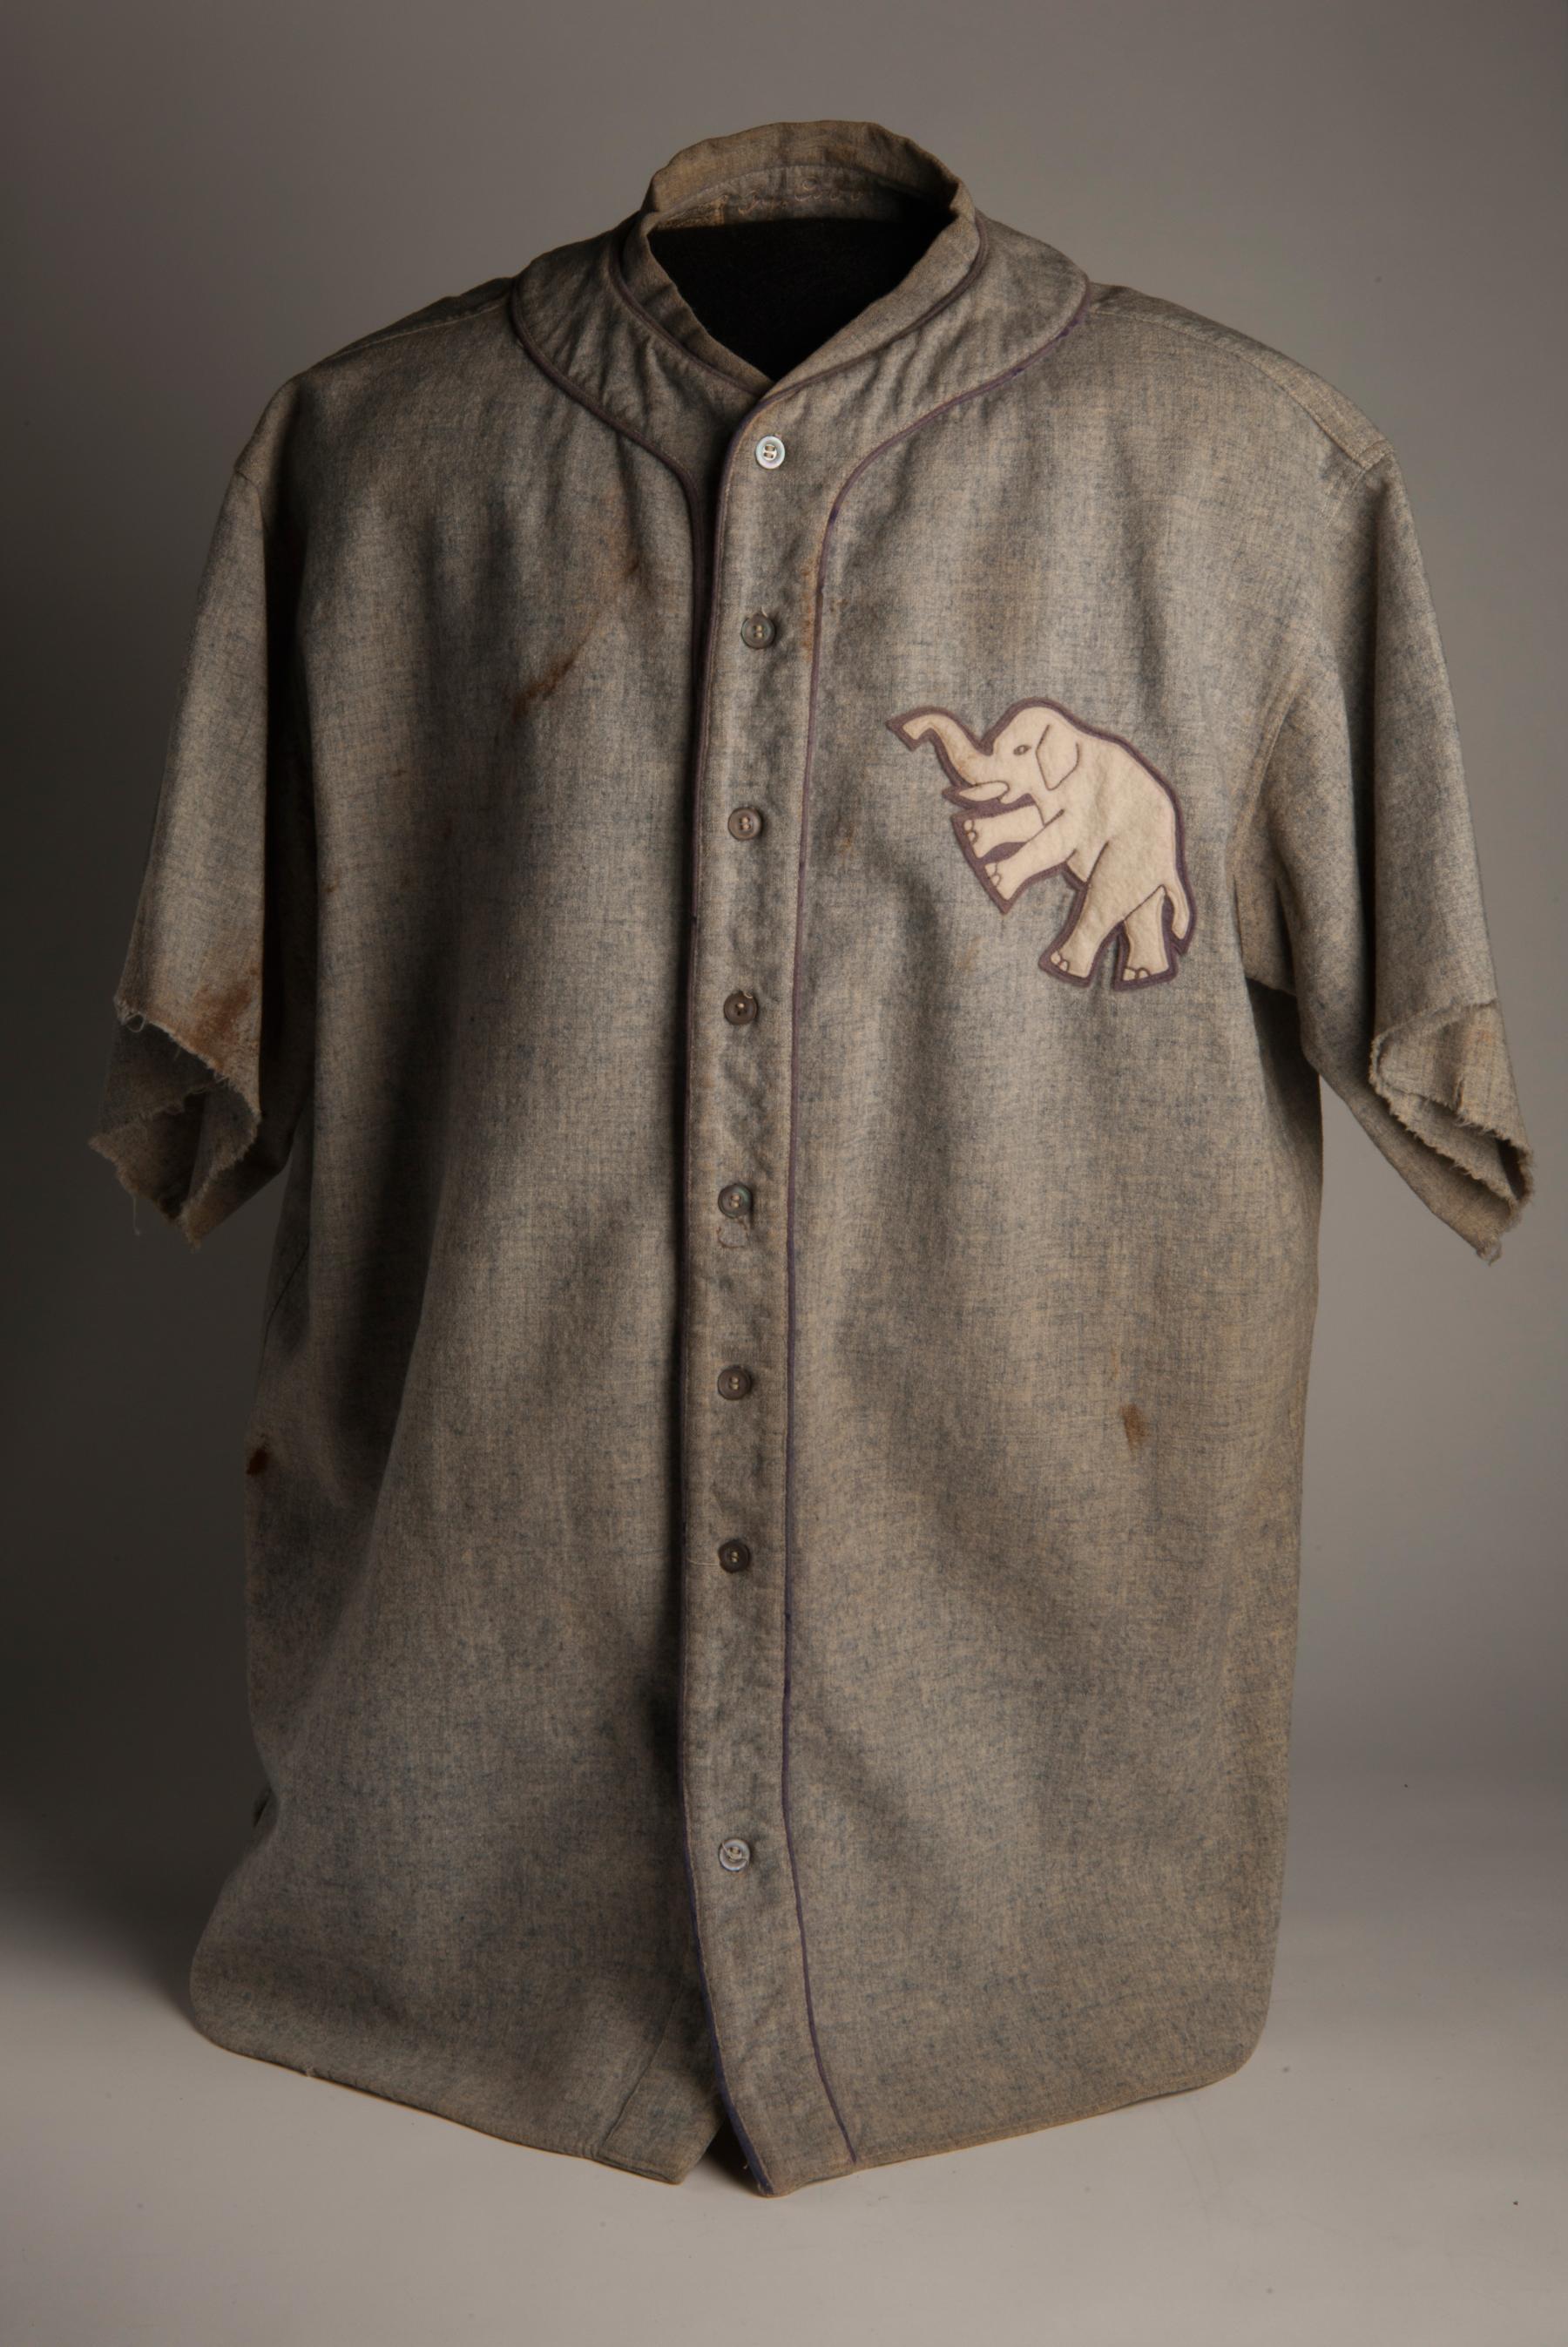 Philadelphia A's uniform shirt worn by Ty Cobb in 1927. B-204-61 (Milo Stewart Jr. / National Baseball Hall of Fame)